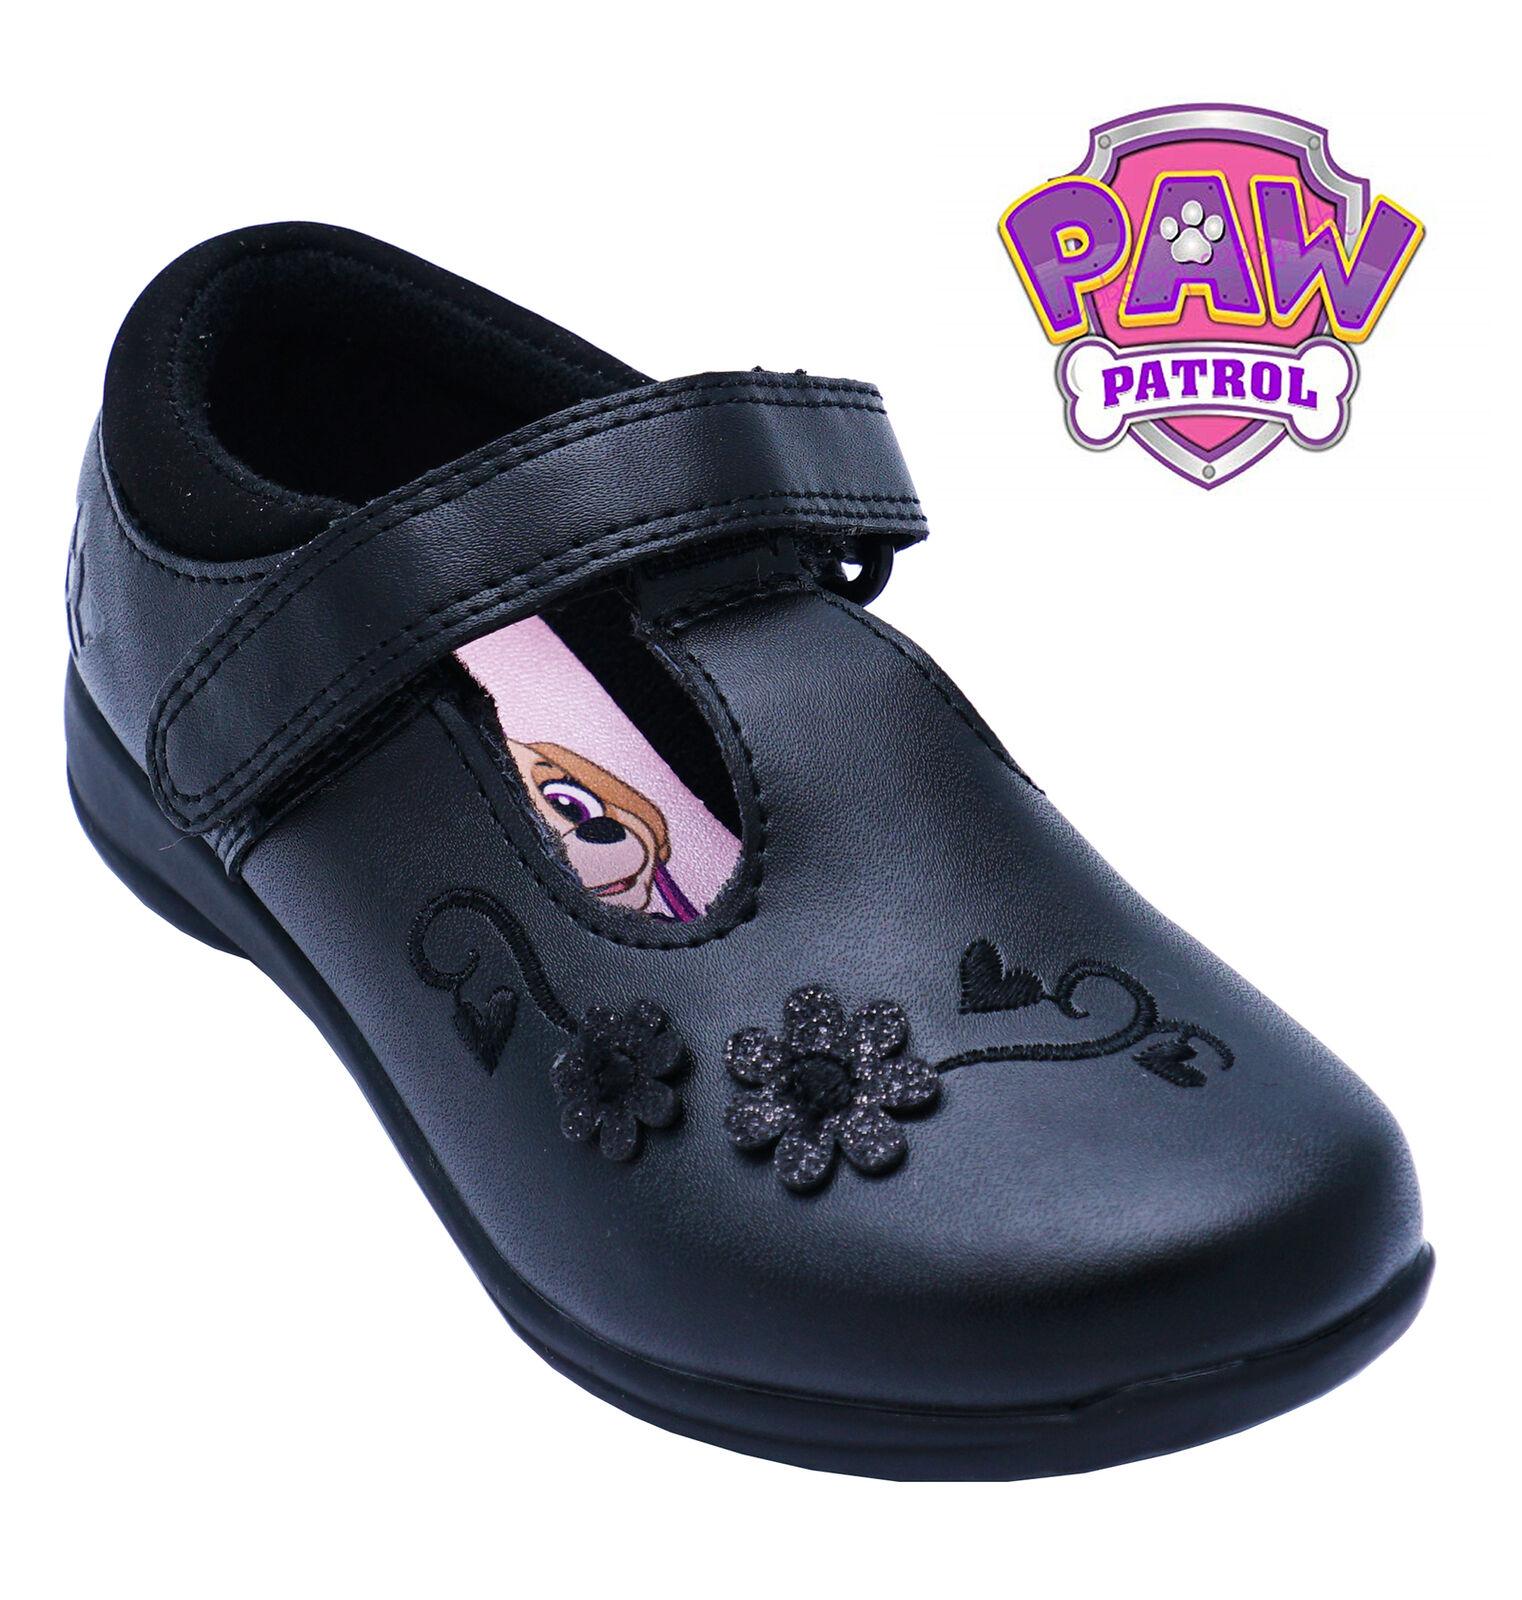 GIRLS PAW PATROL BLACK DOLLY PUMPS SCHOOL BALLET FLAT INFANTS KIDS SHOES UK 6-12